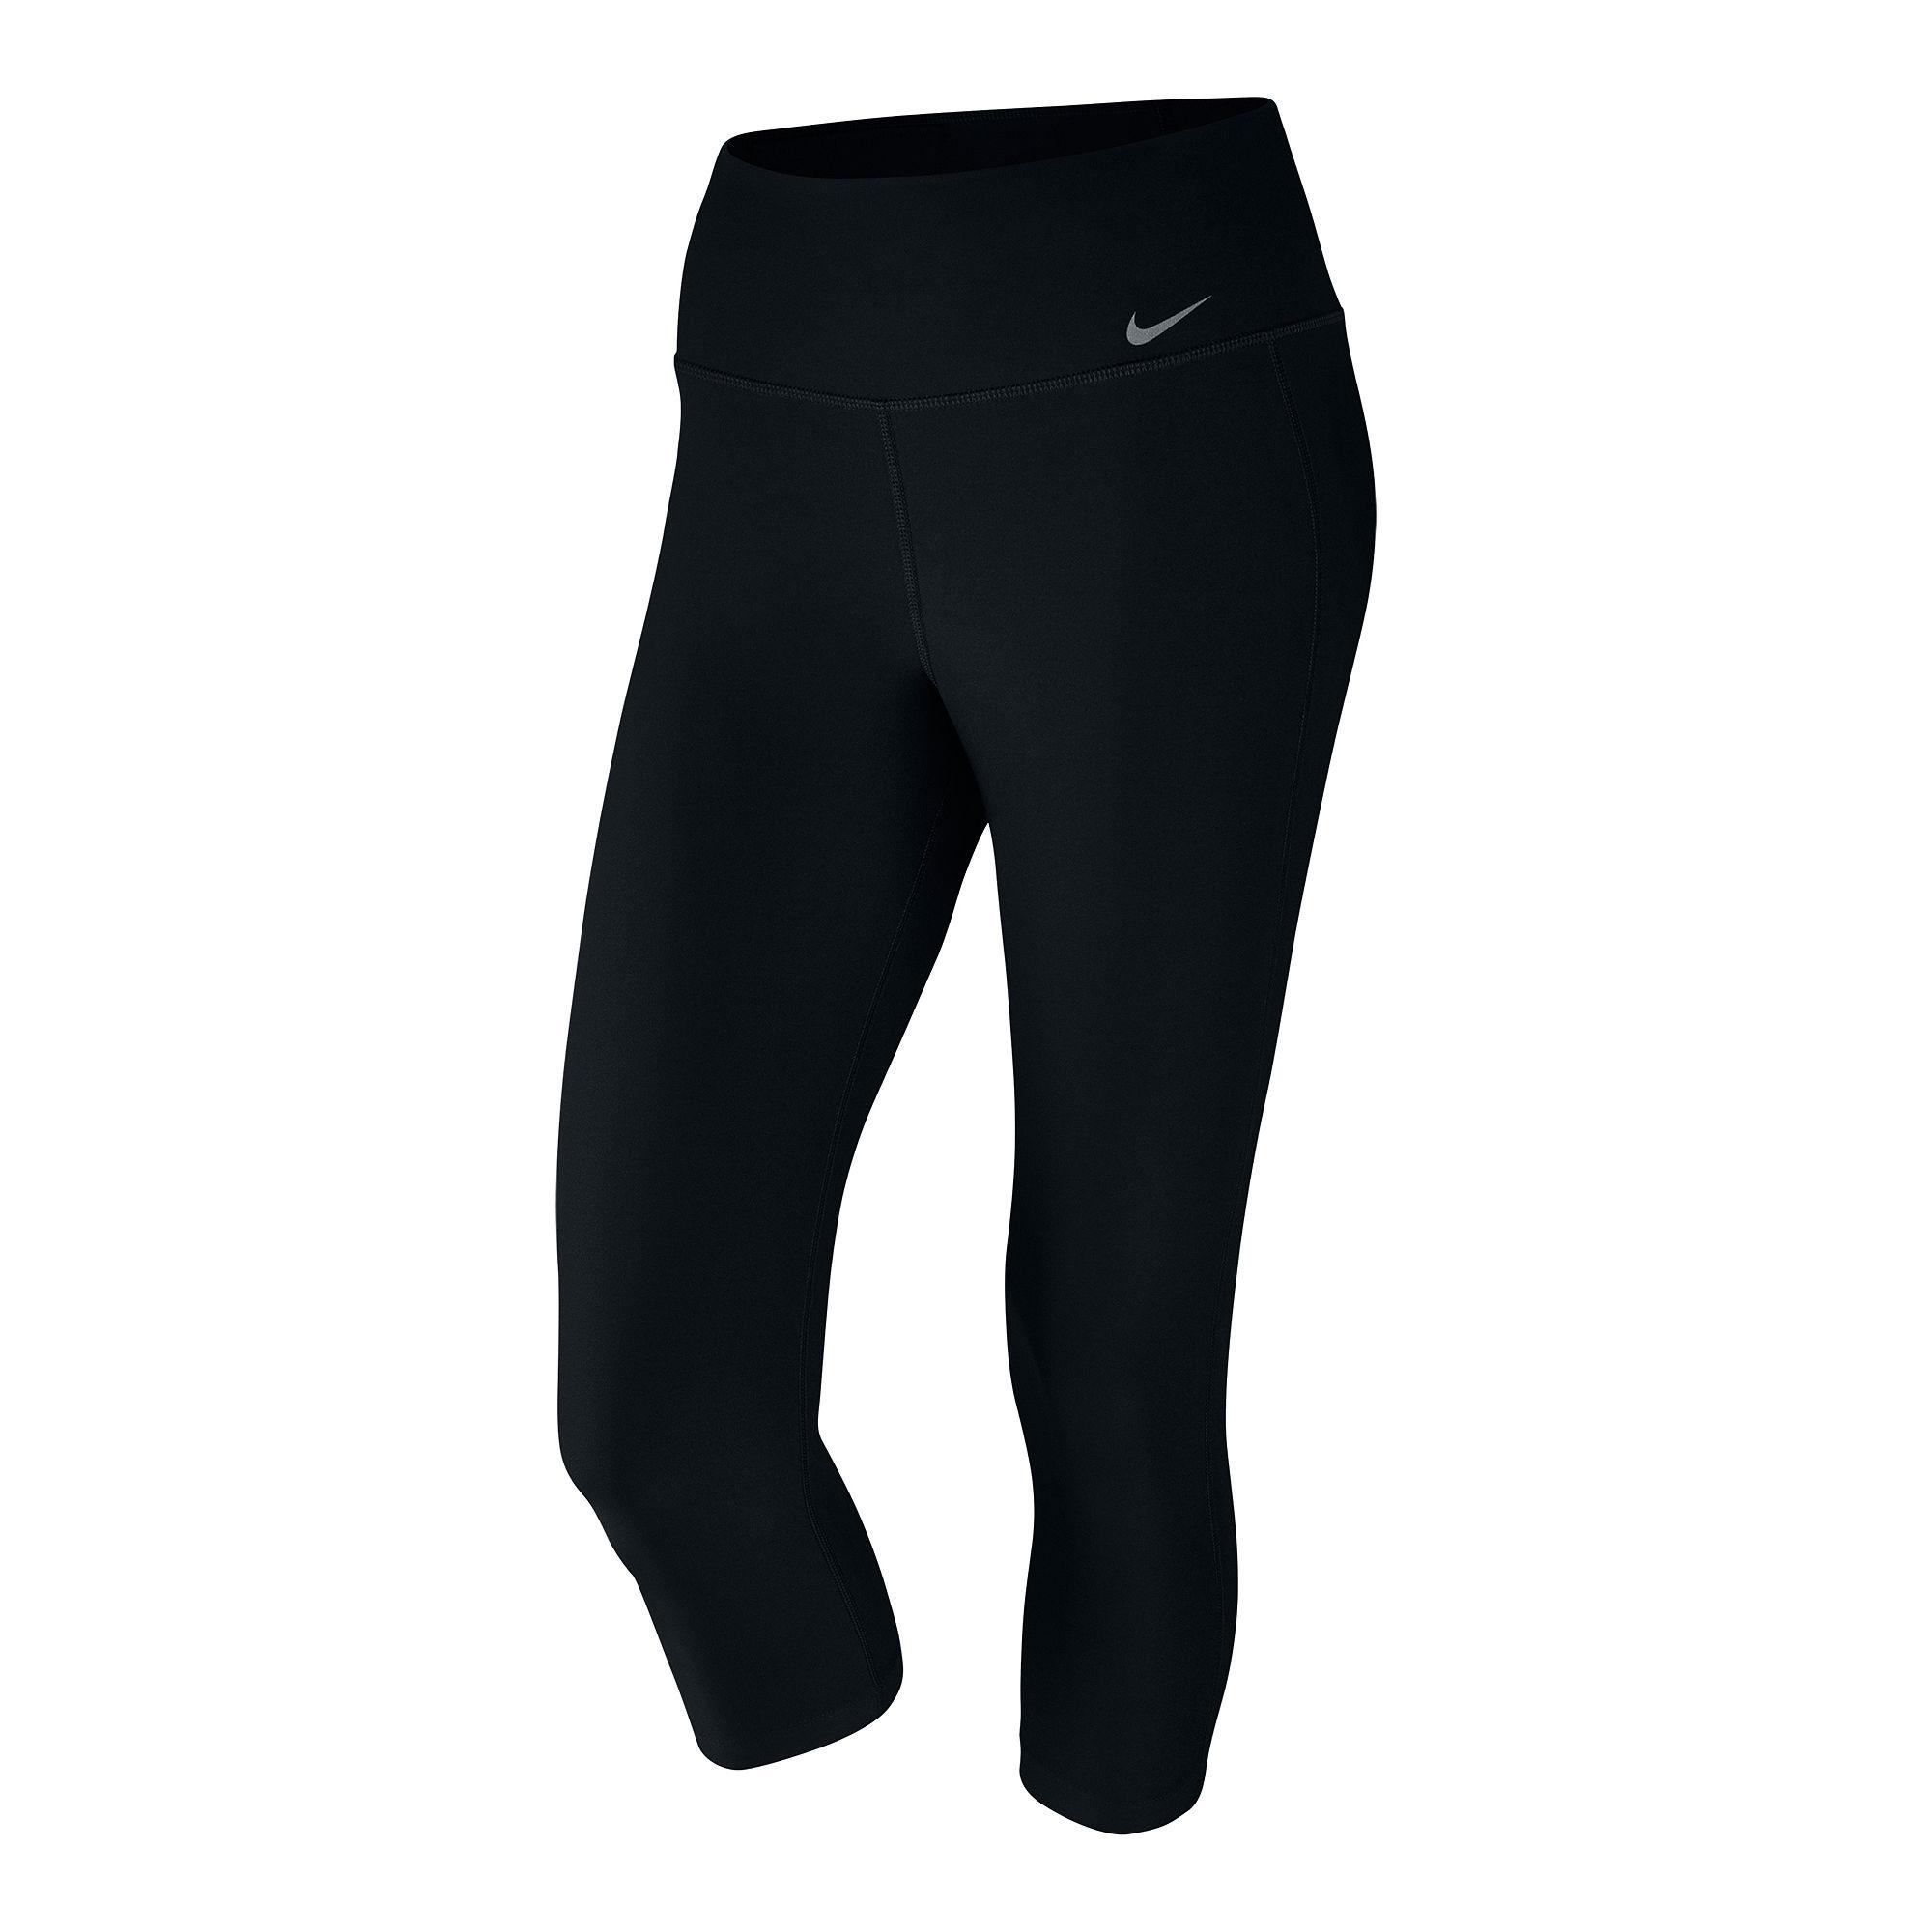 Nike Power Dri-FIT Knit Capris